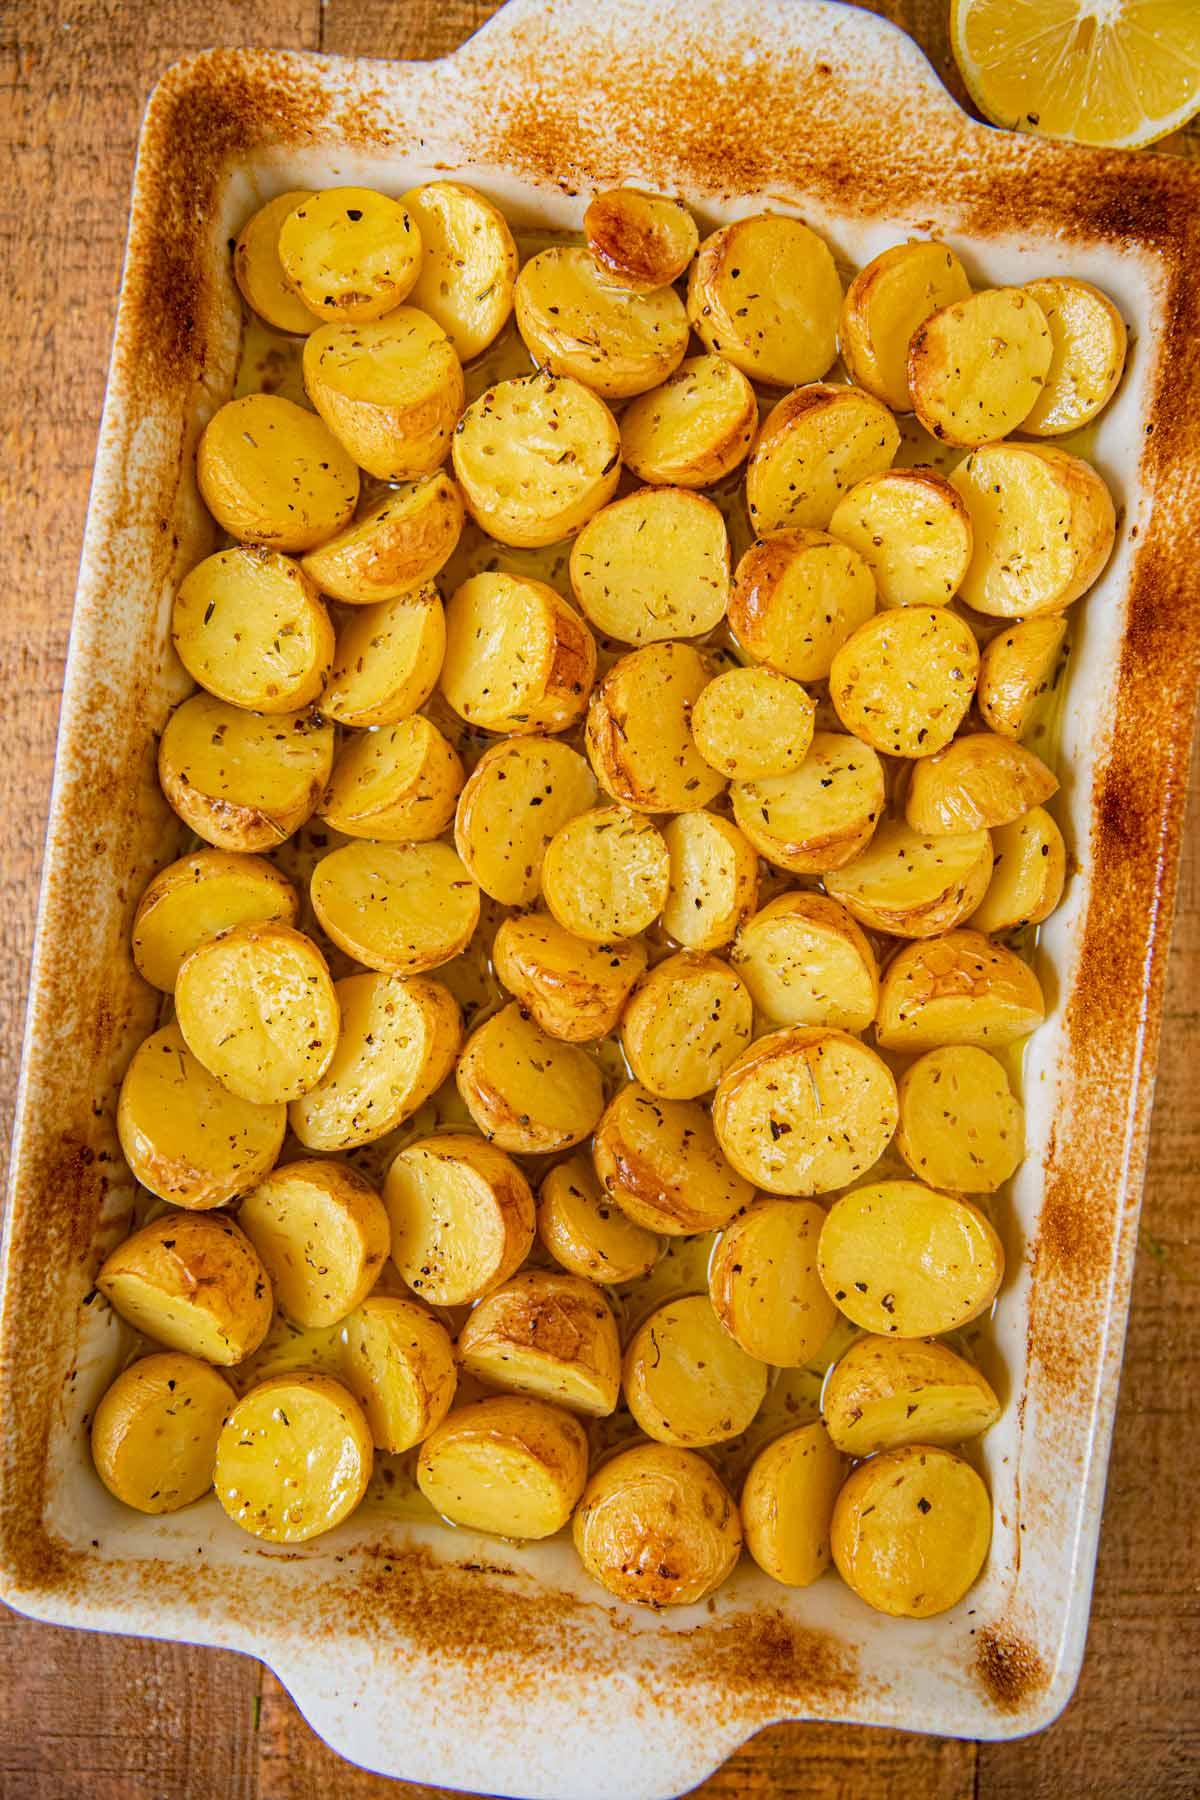 Greek Lemon Potatoes in baking dish